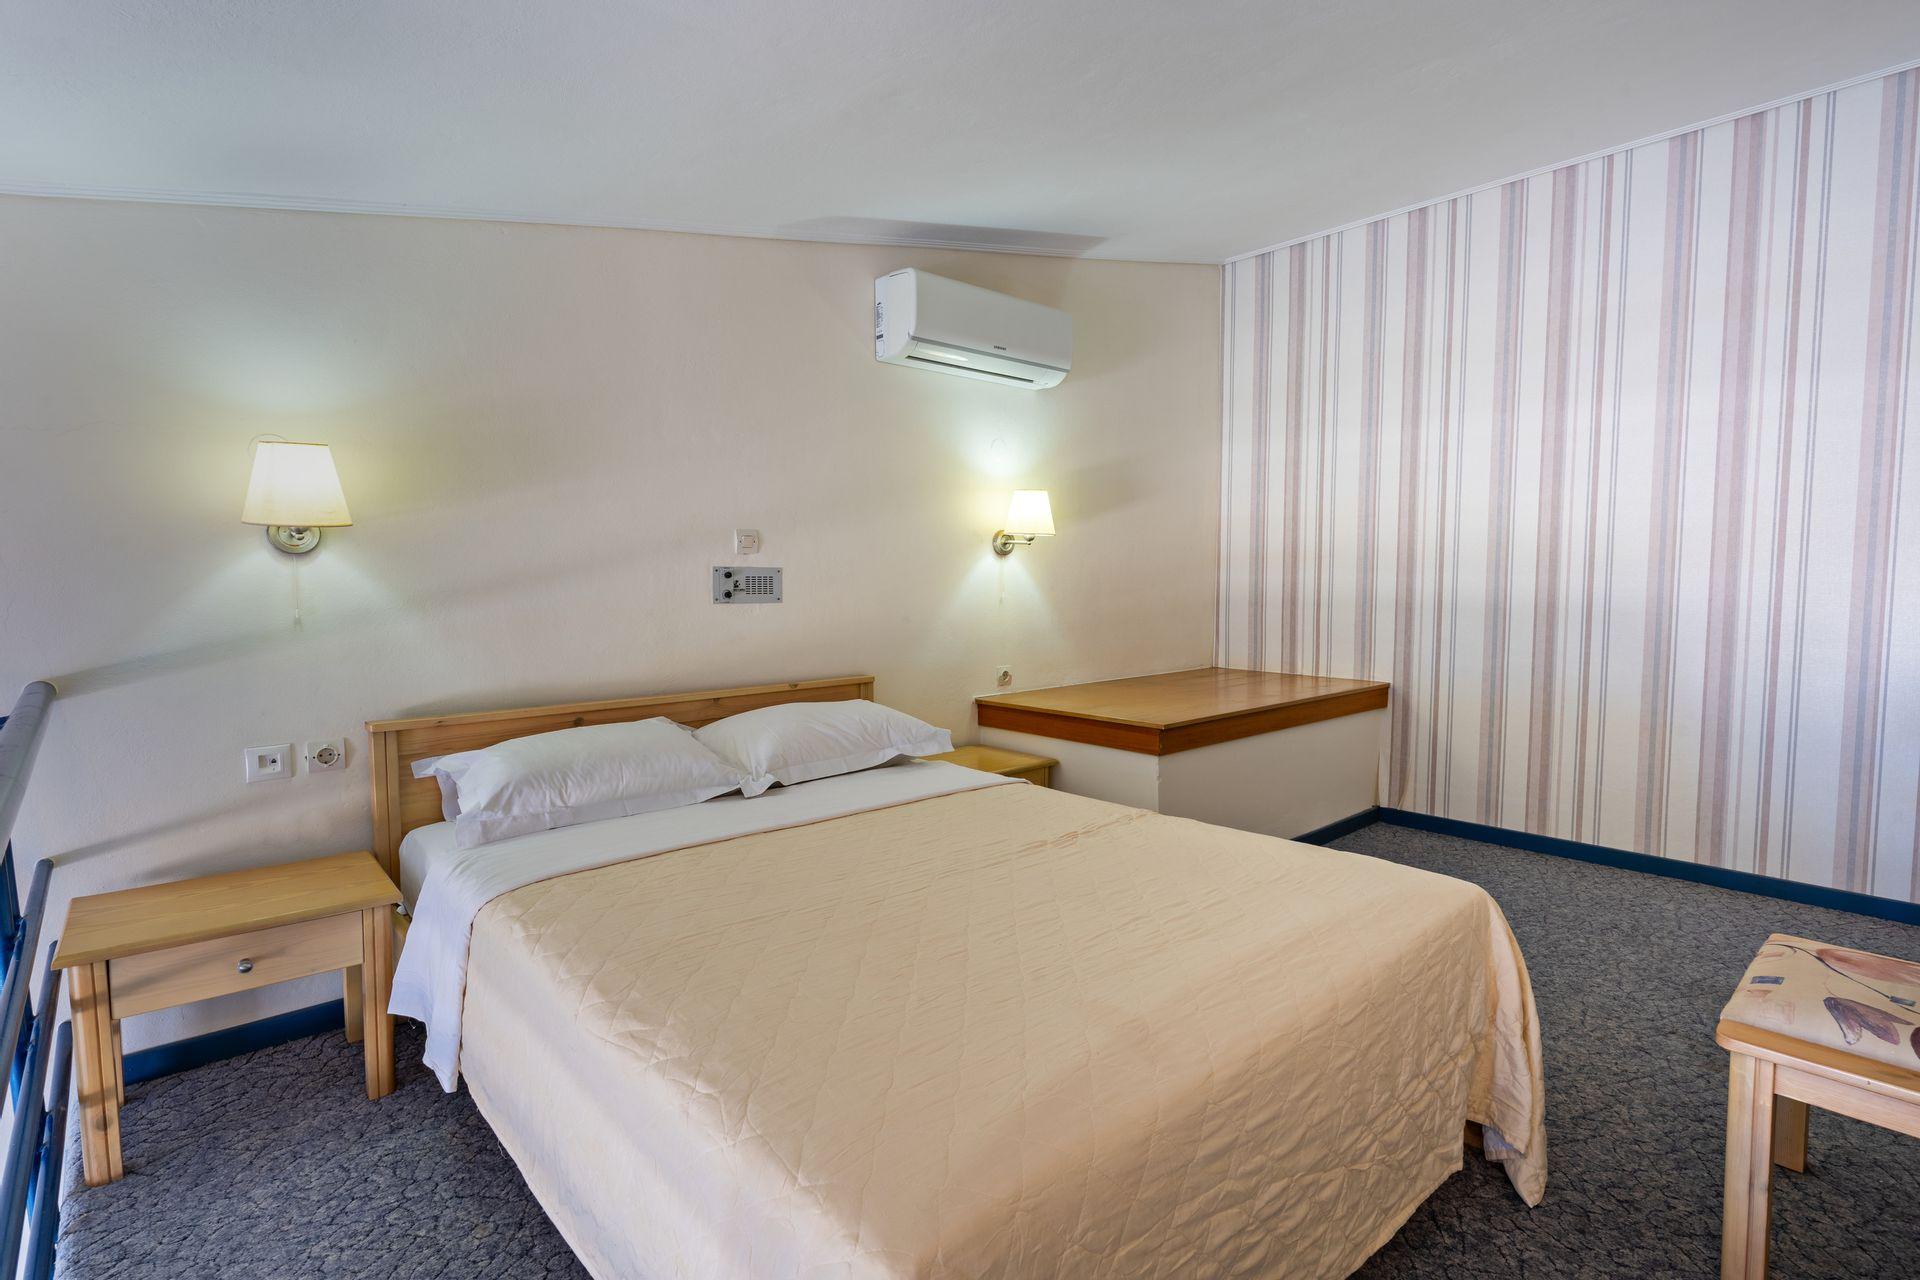 Pearl Beach Apartments - Ρέθυμνο, Κρήτη ✦ 2 Ημέρες (1 Διανυκτέρευση) ✦ 2 άτομα + 1 παιδί έως 5 ετών ✦ Χωρίς Πρωινό ✦ 01/09/2021 έως 30/09/2021 ✦ Μπροστά στην παραλία!